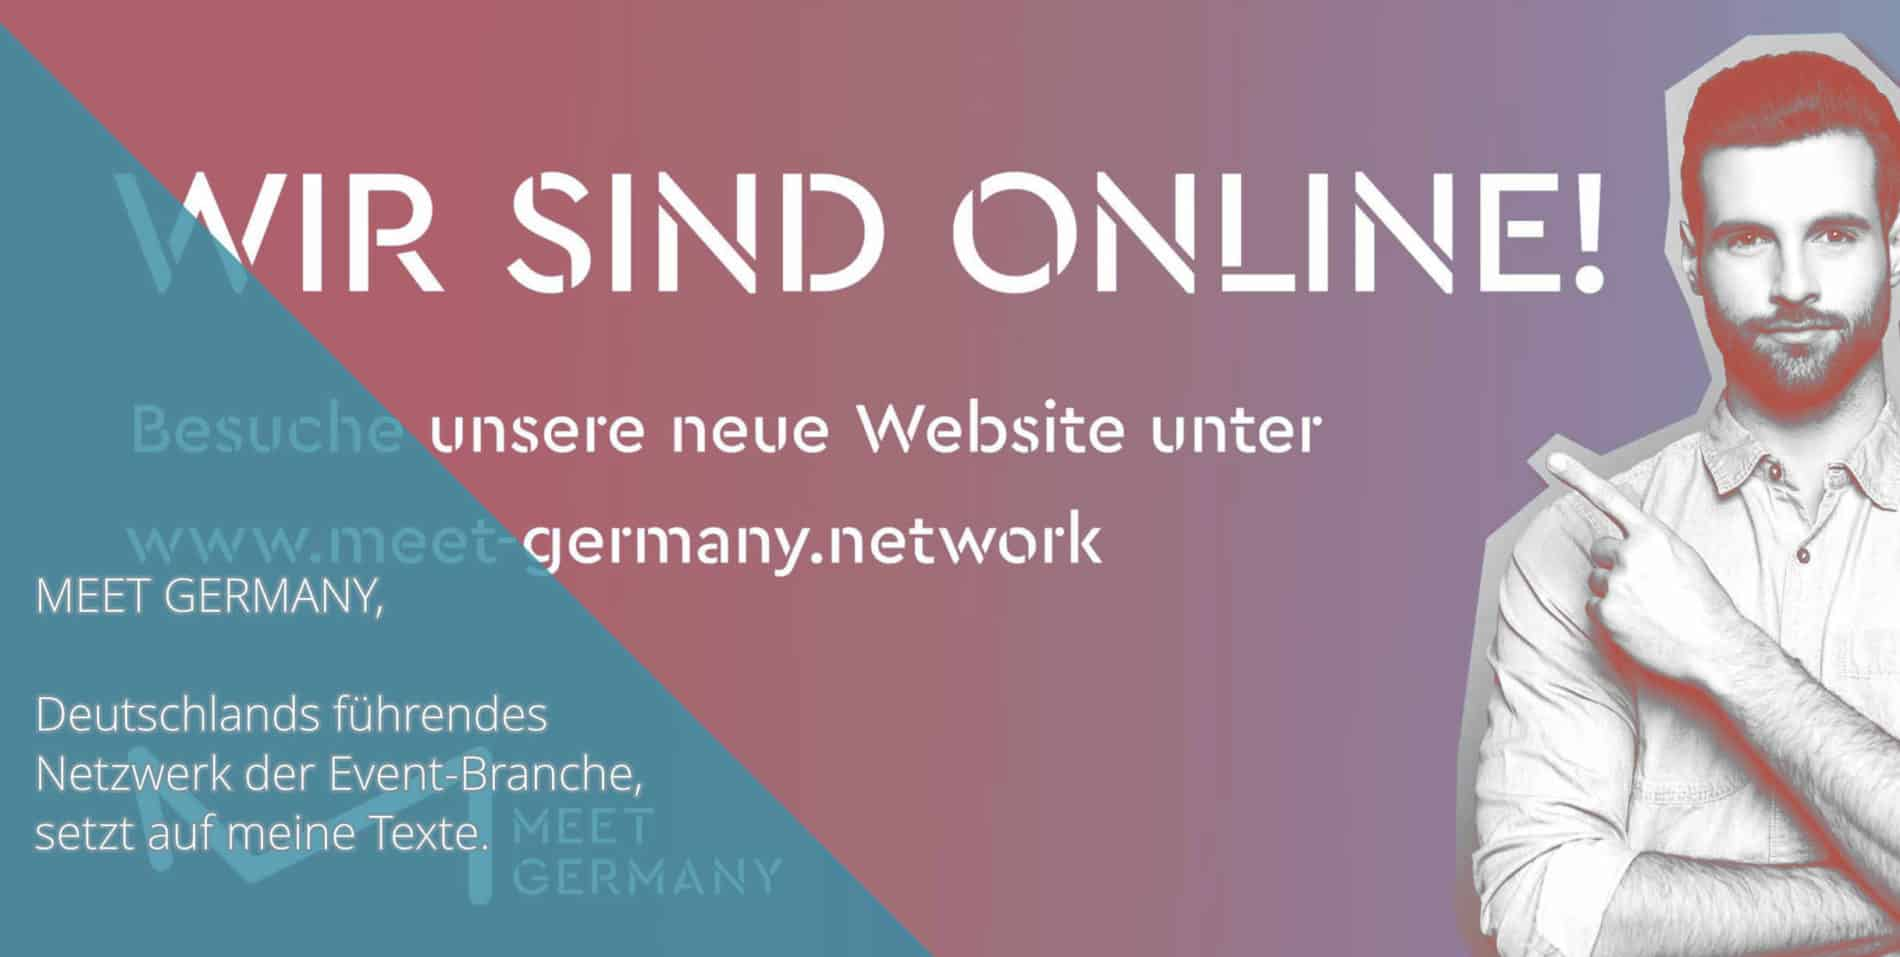 Meet Germany Homepage Arbeitsprobe Tim Allgaier Texter PR Freelancer Werbetexter Köln